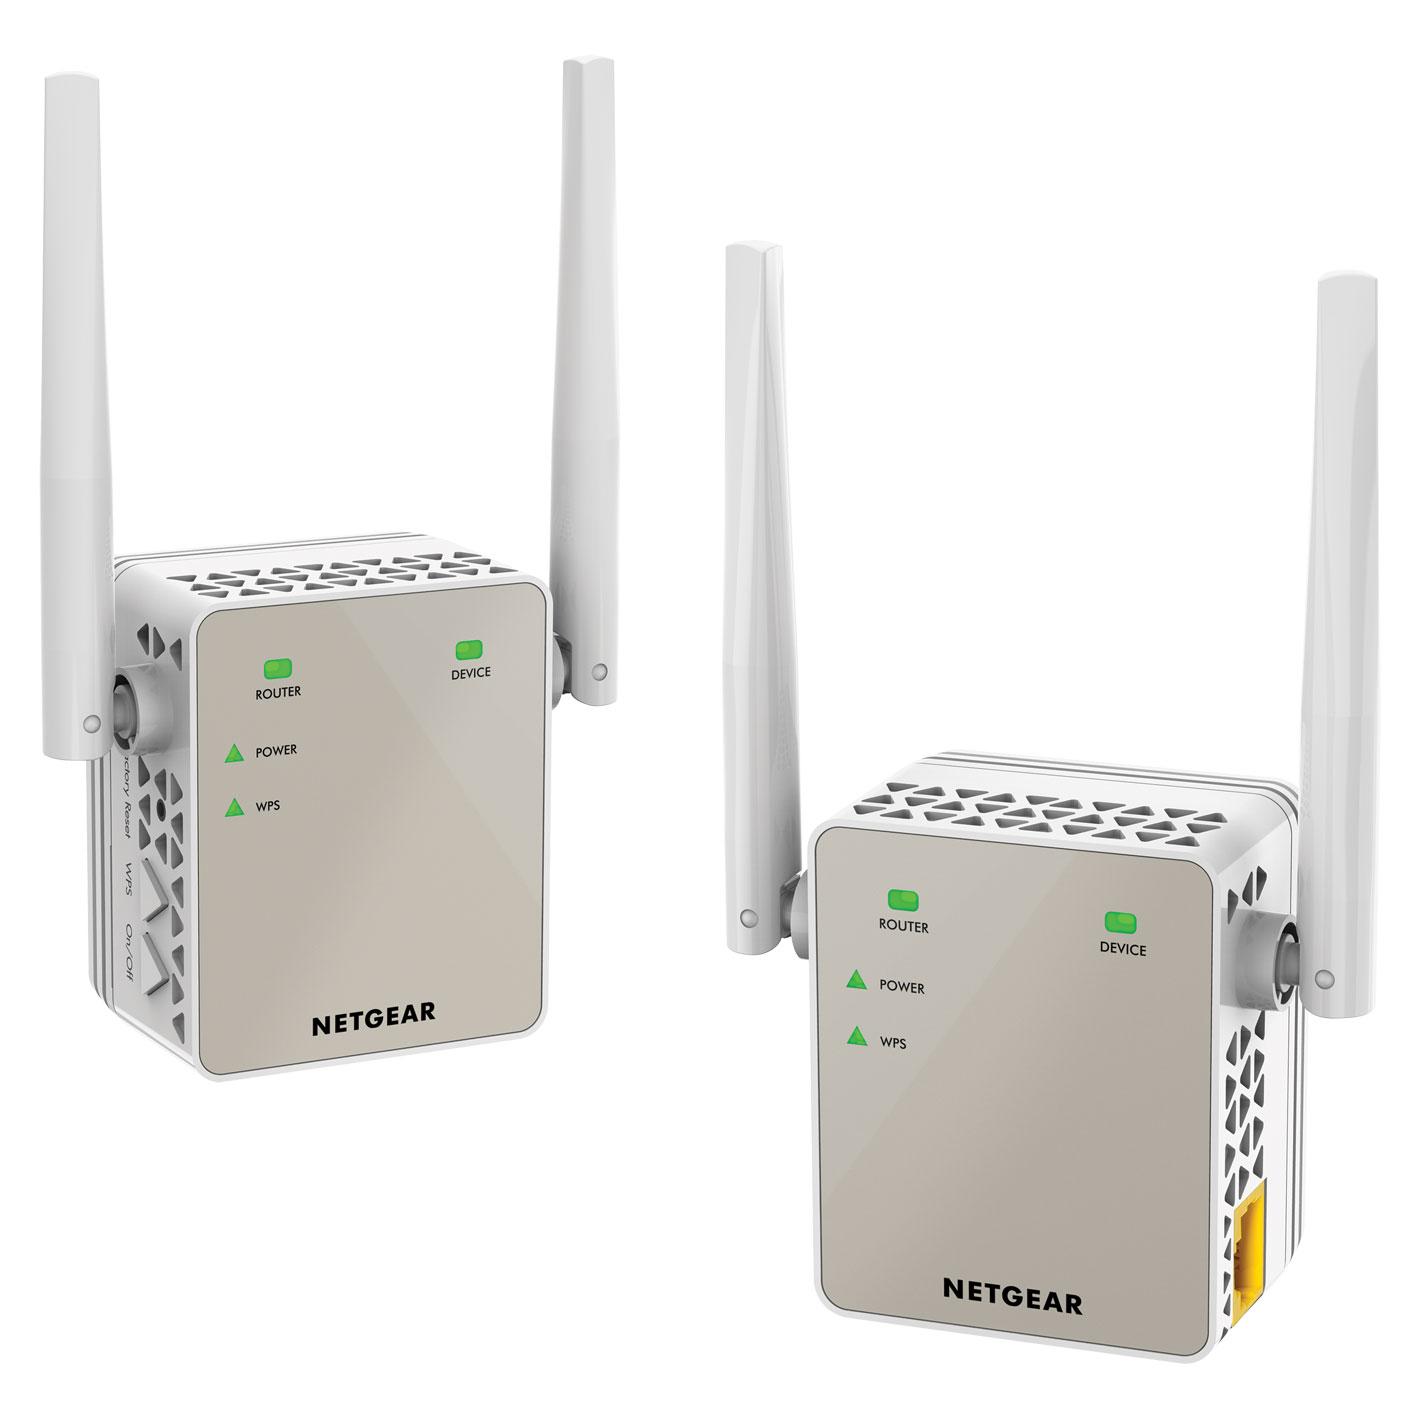 NETGEAR AC1200 Plug-In Wi-Fi Range Extender 2 Pack | eBay